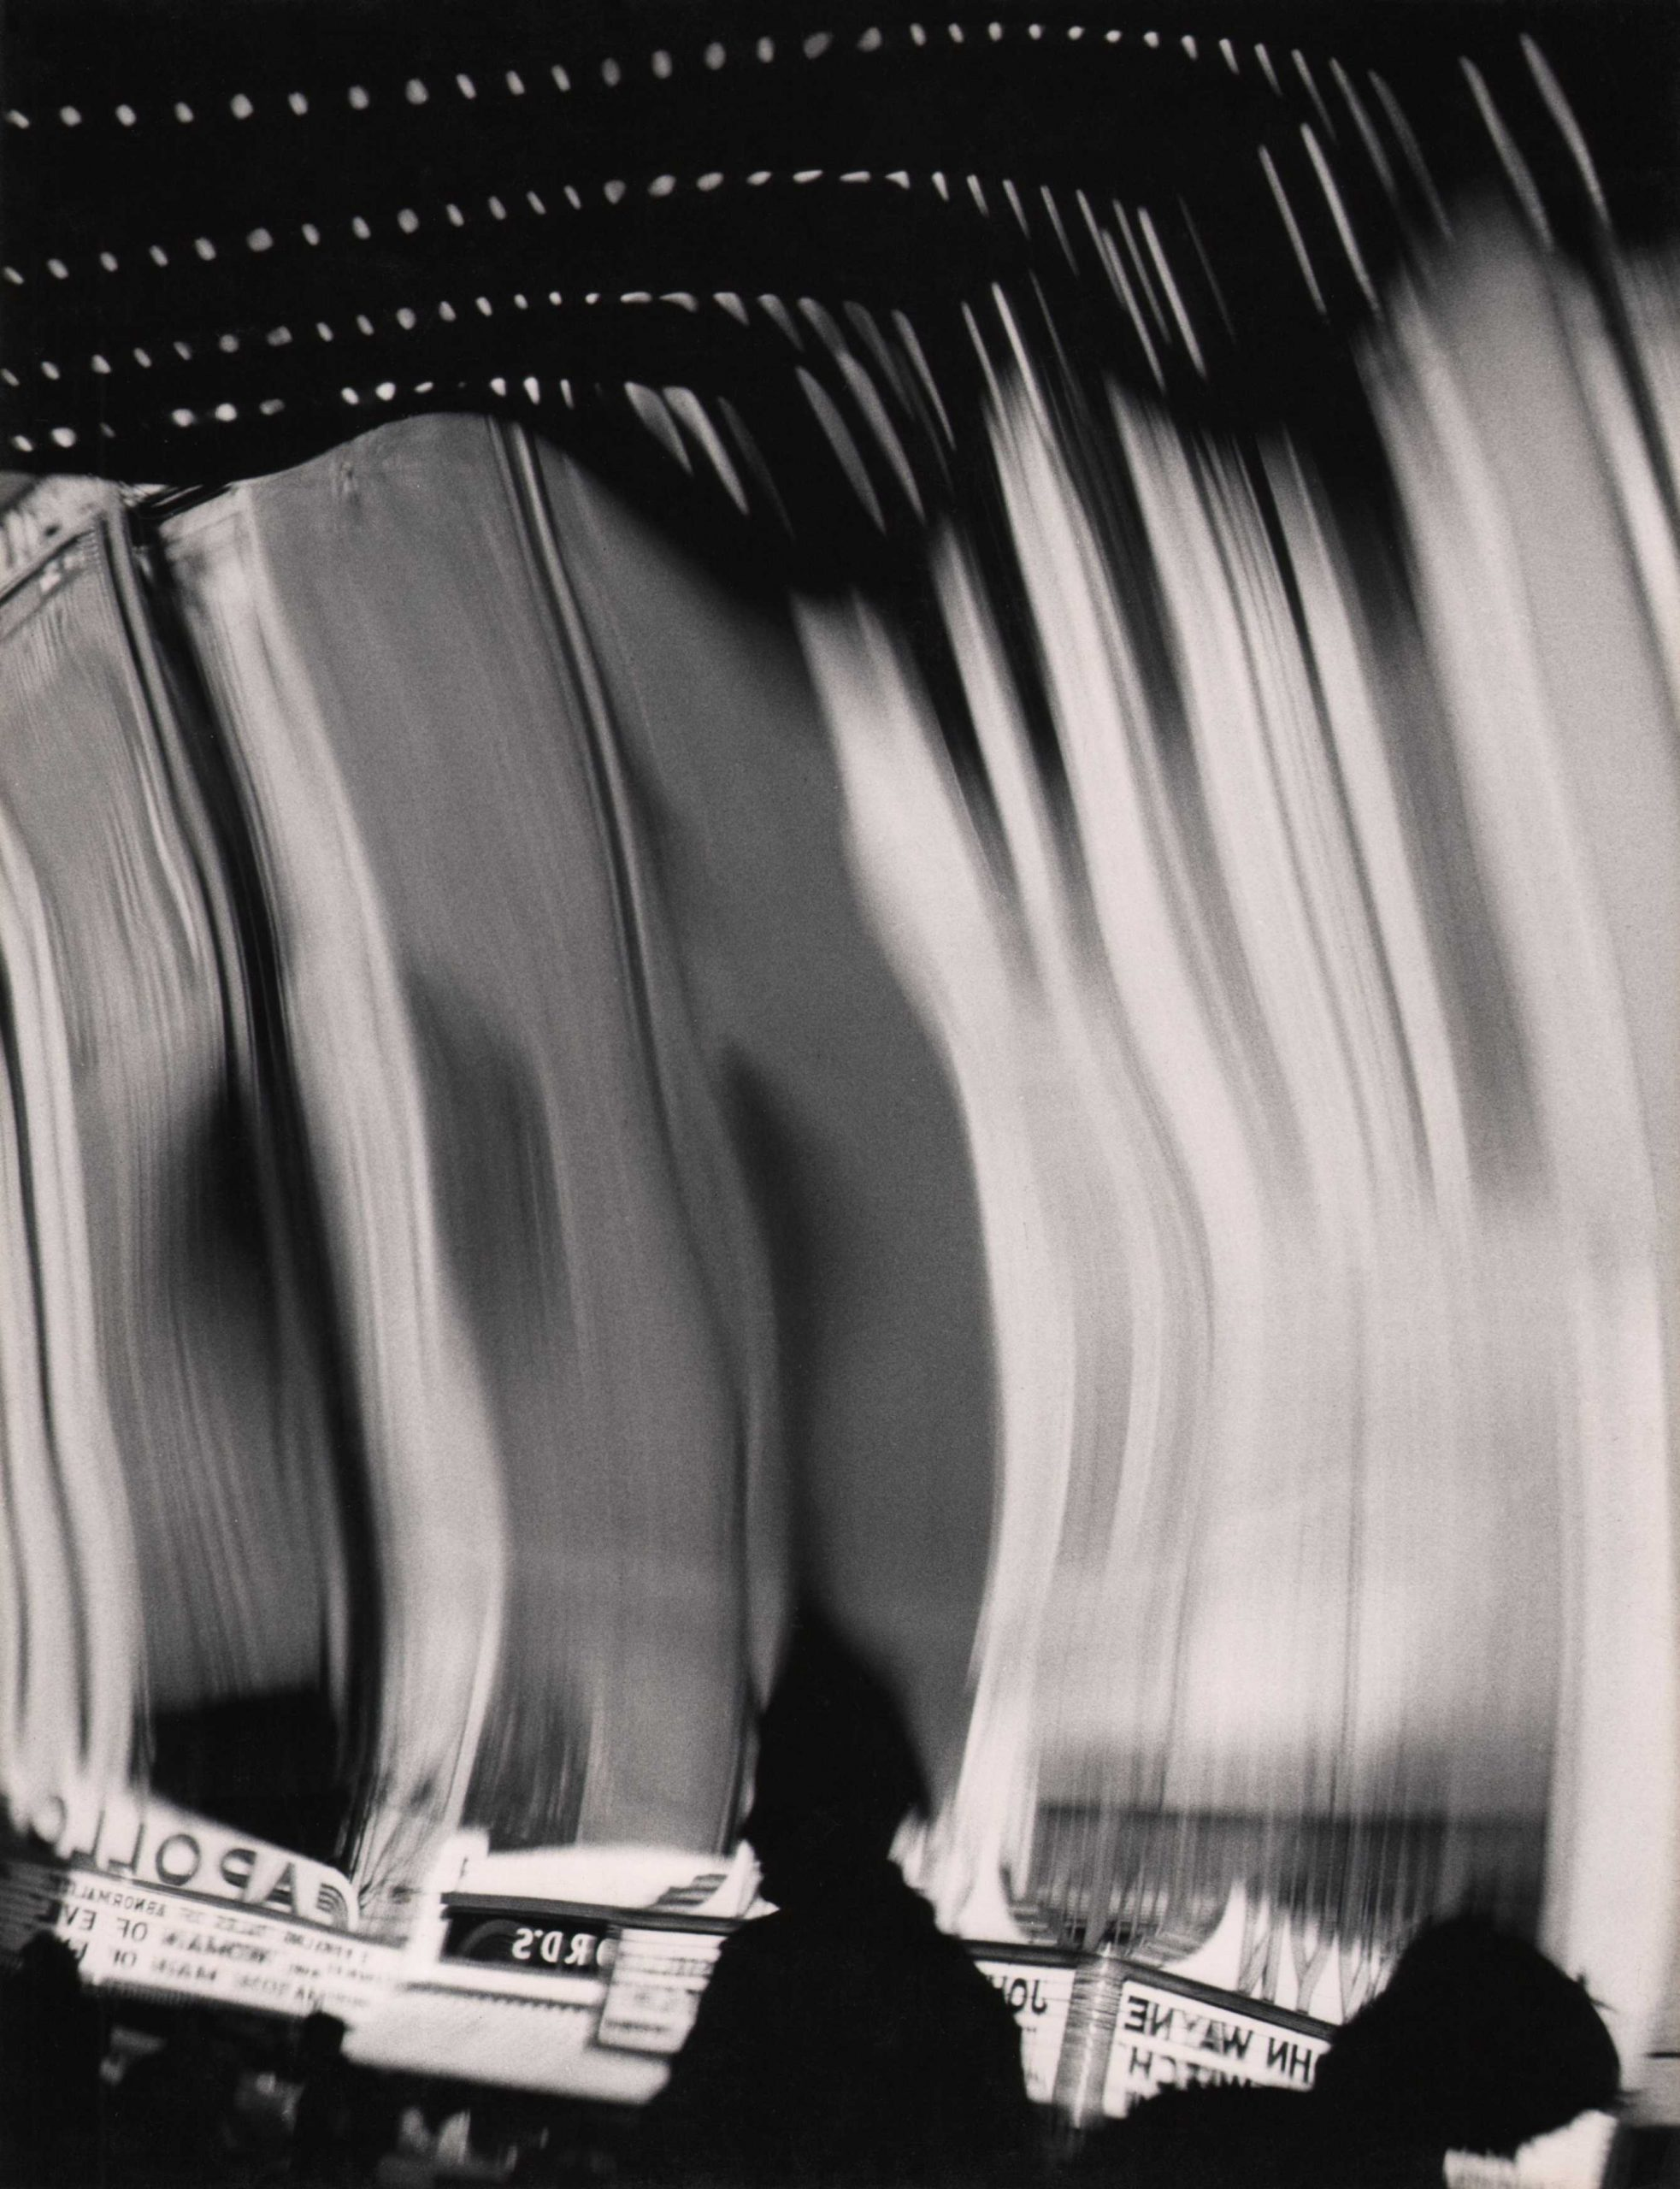 Benn Mitchell, Mirrors of Life, 42nd Street, 1949